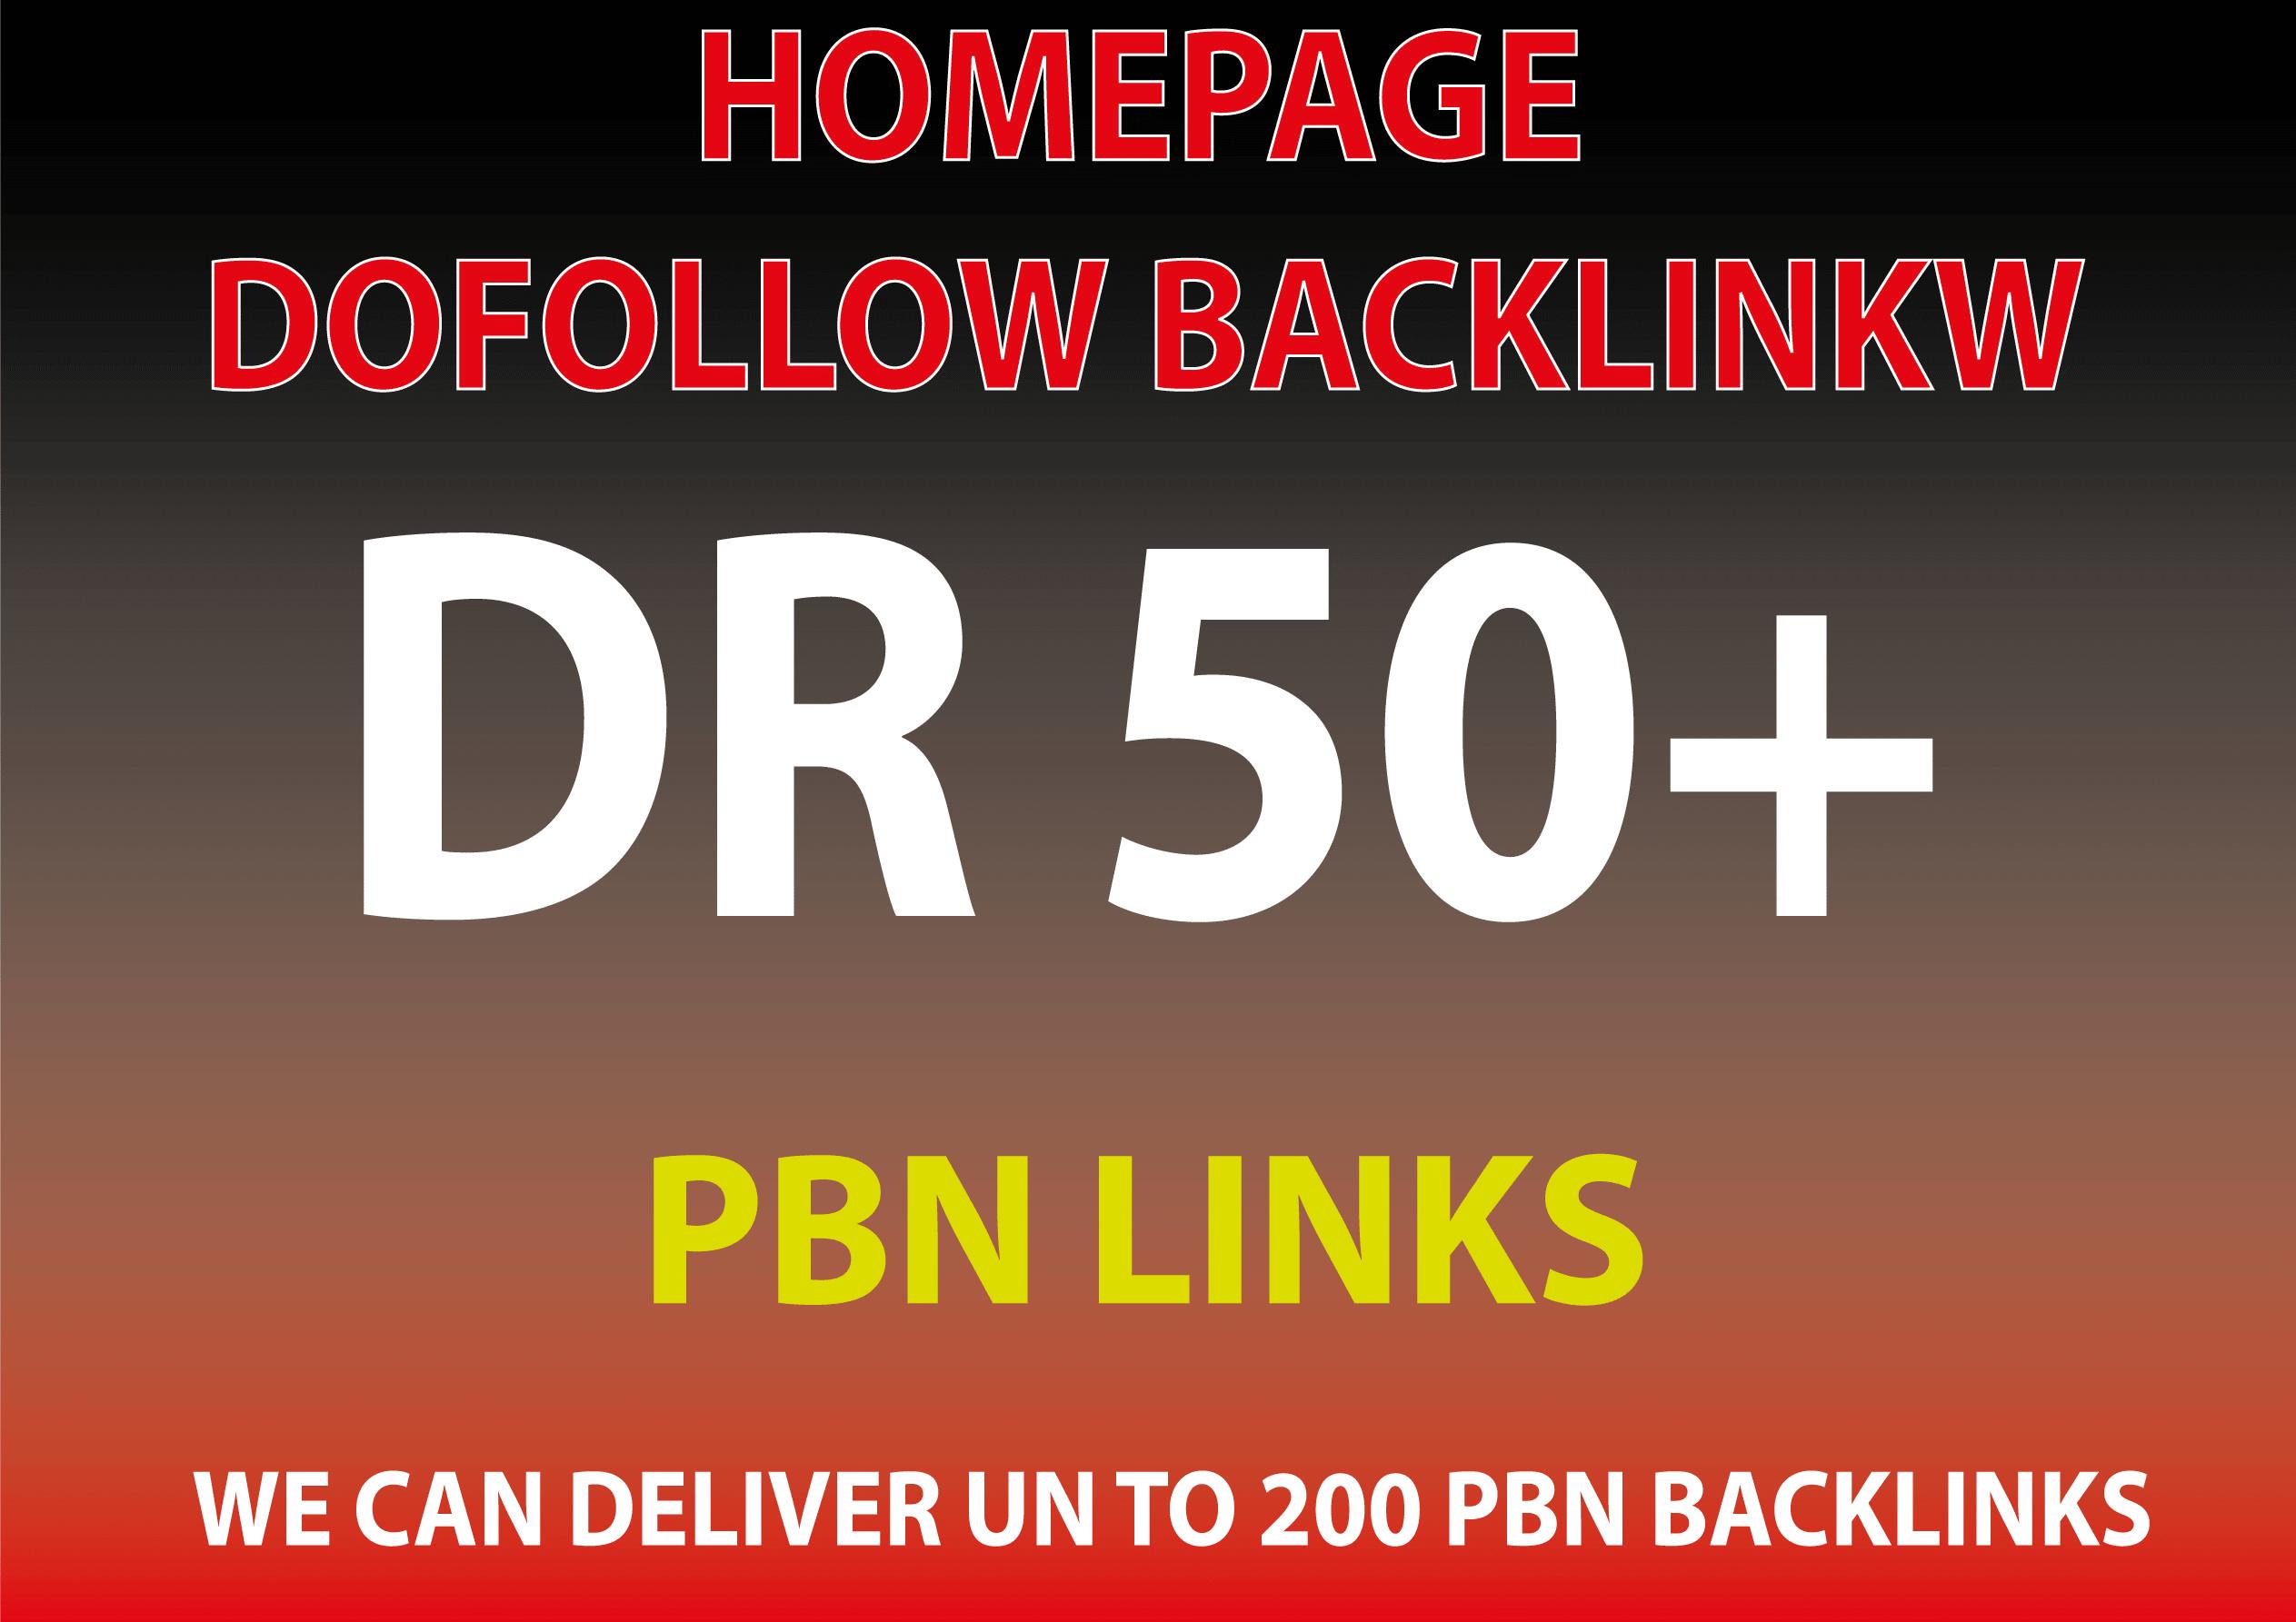 Create manual 25 high quality homepage PBN backlinks